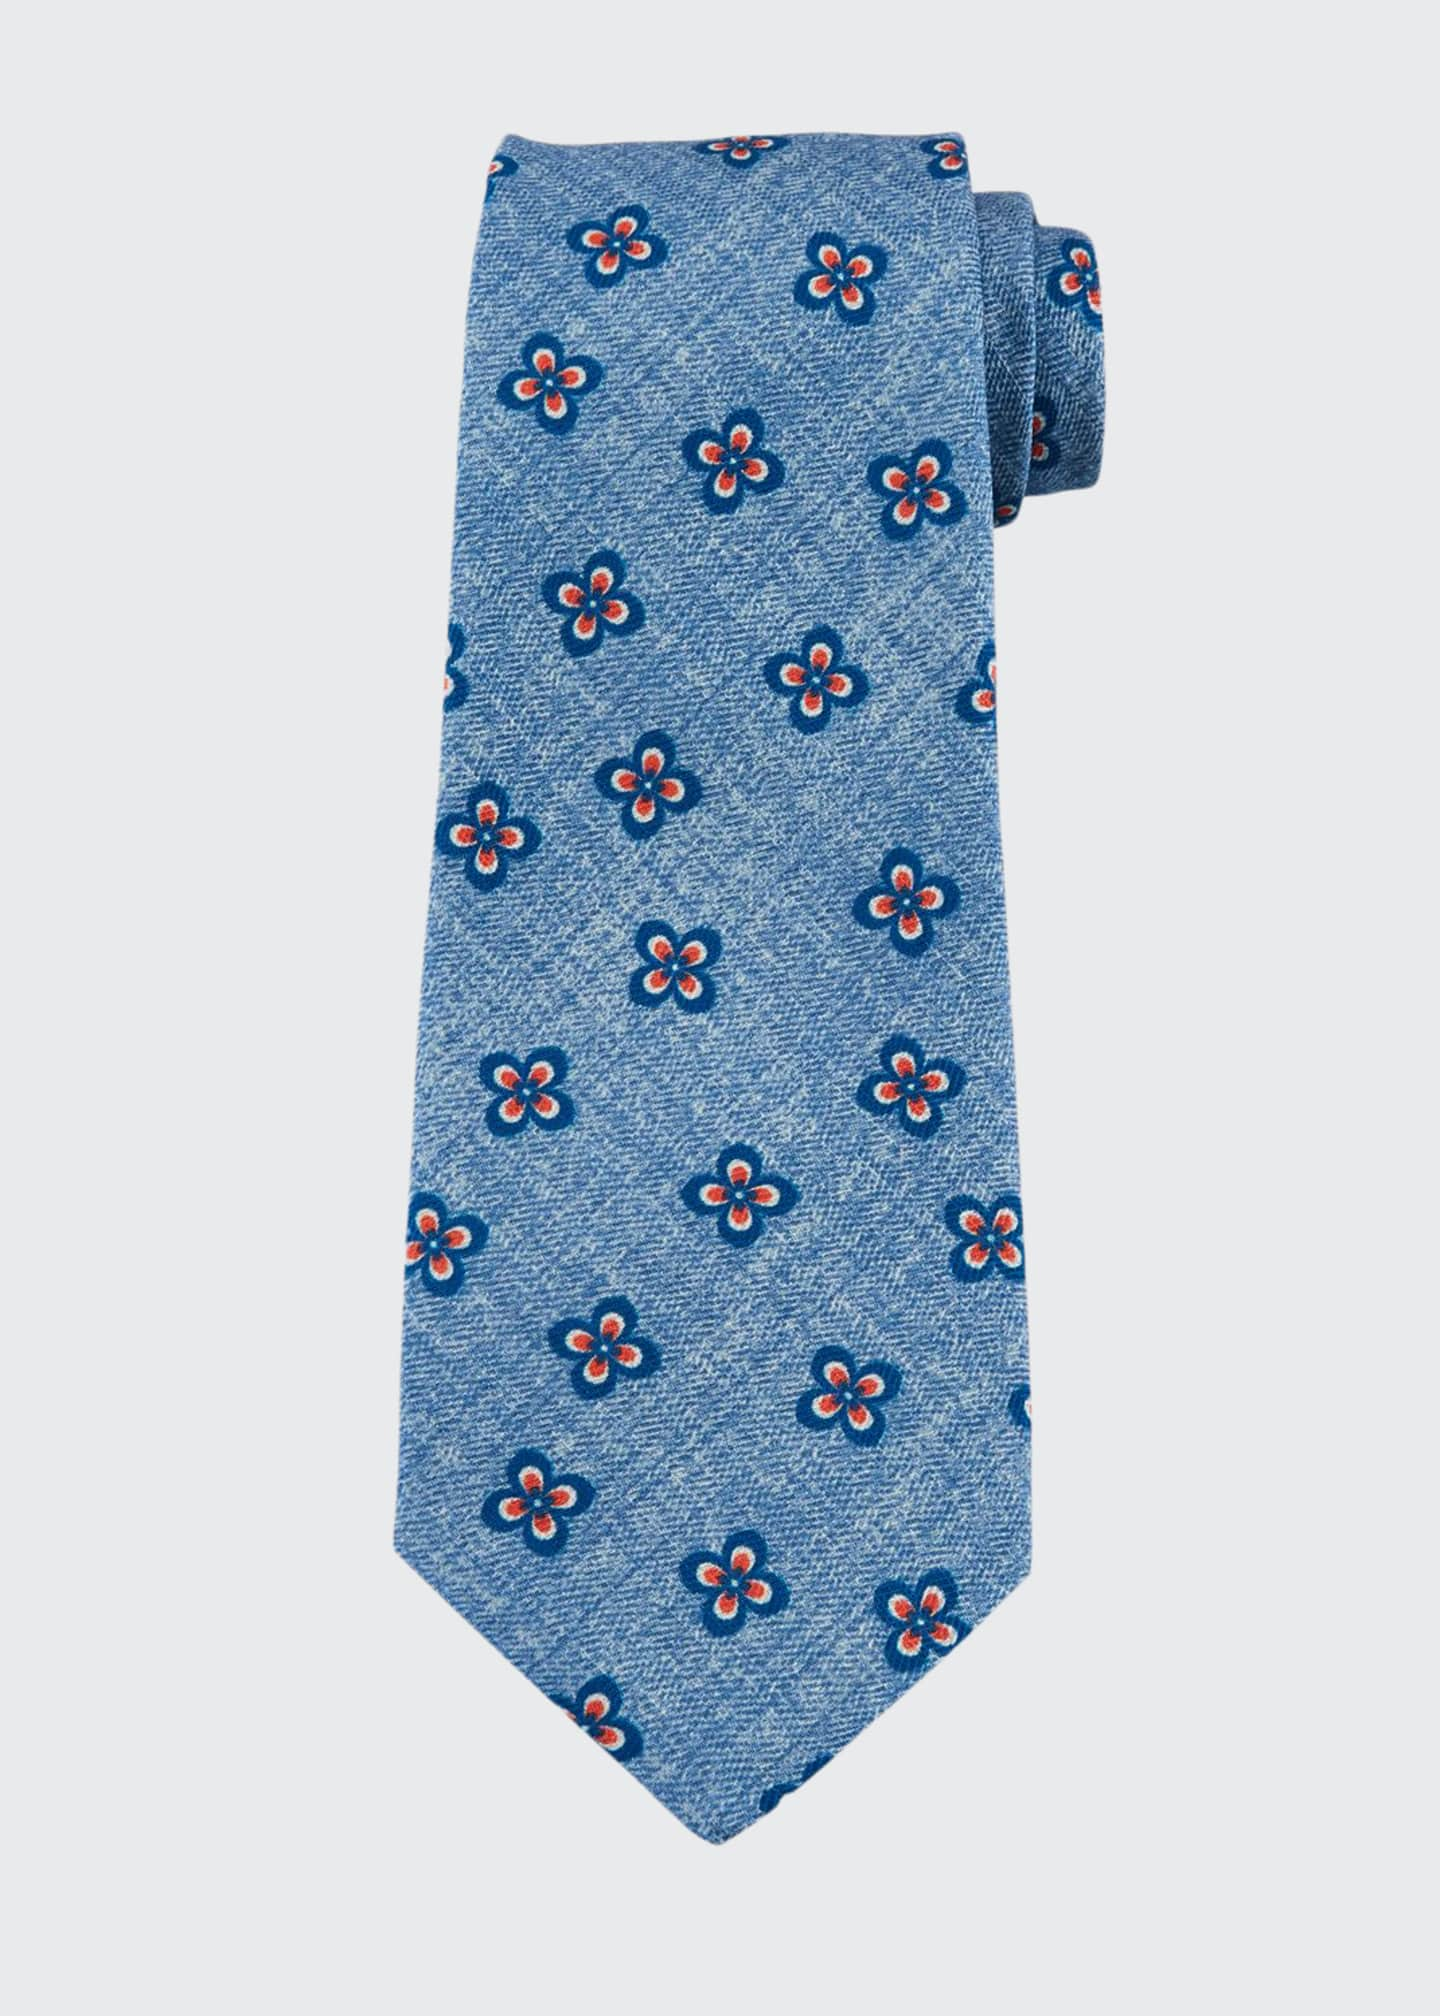 Kiton Four-Petal Floral Silk Tie